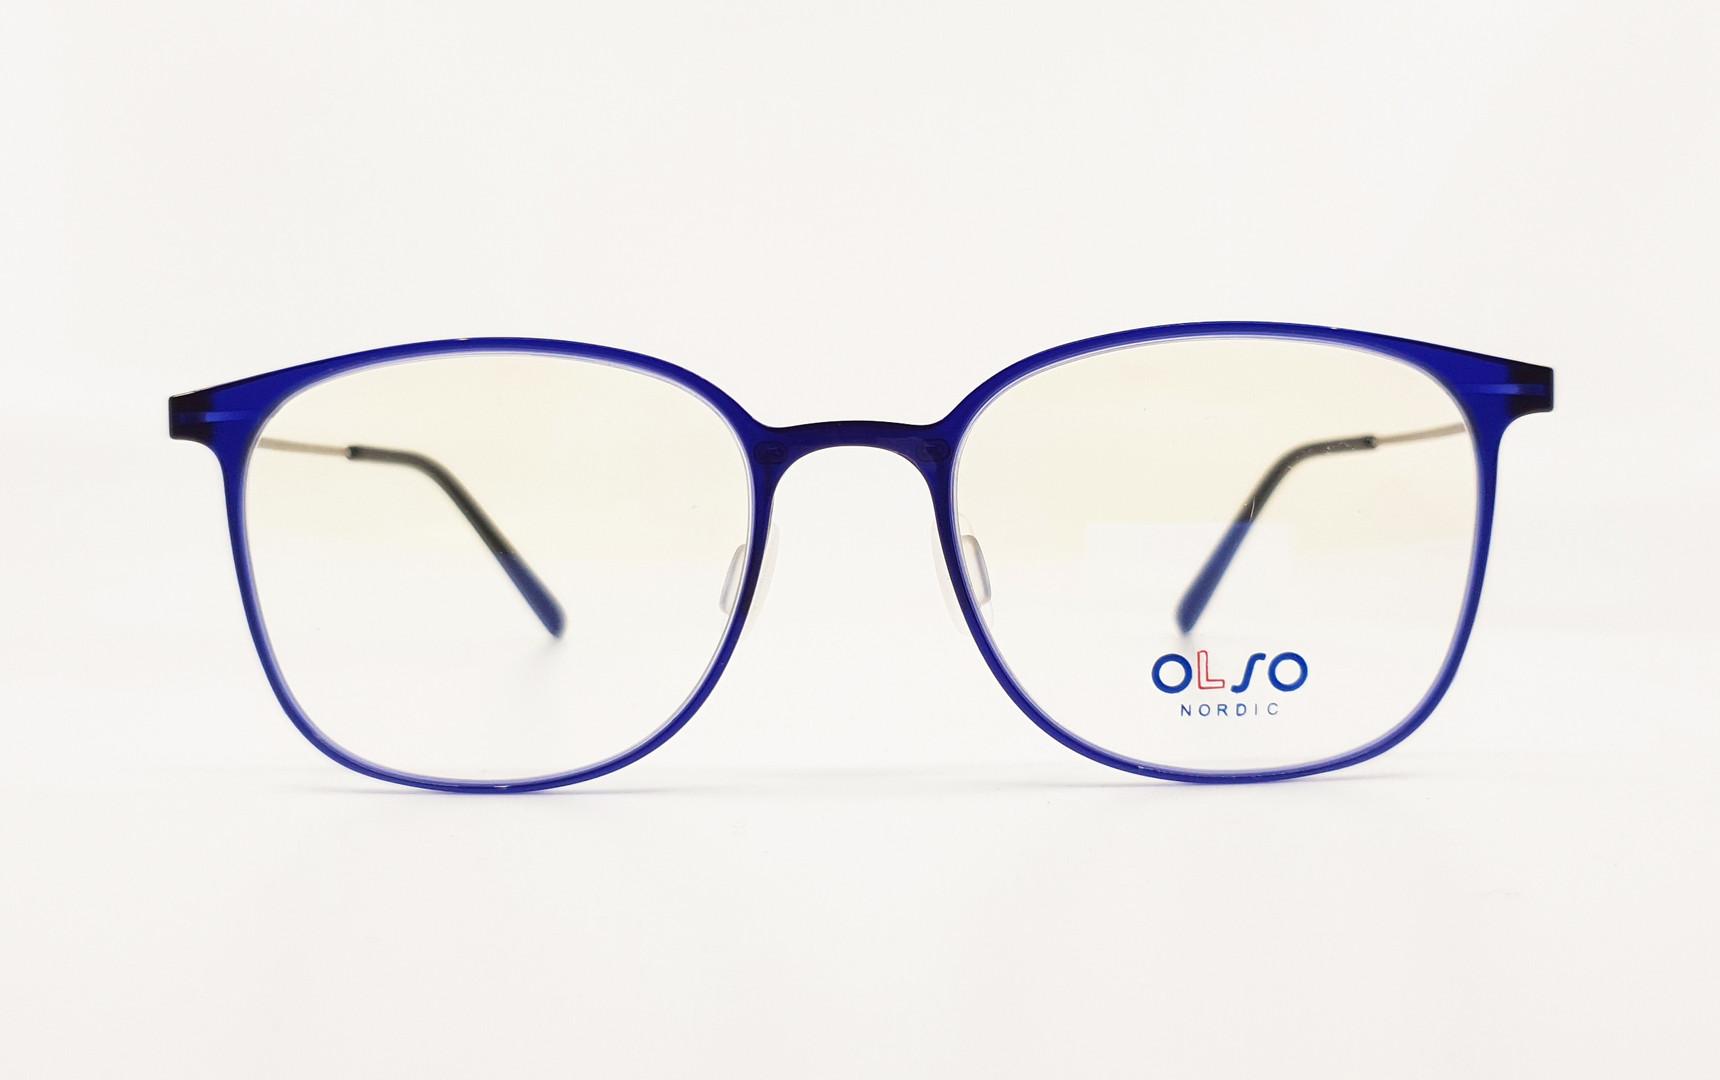 OLSO 103